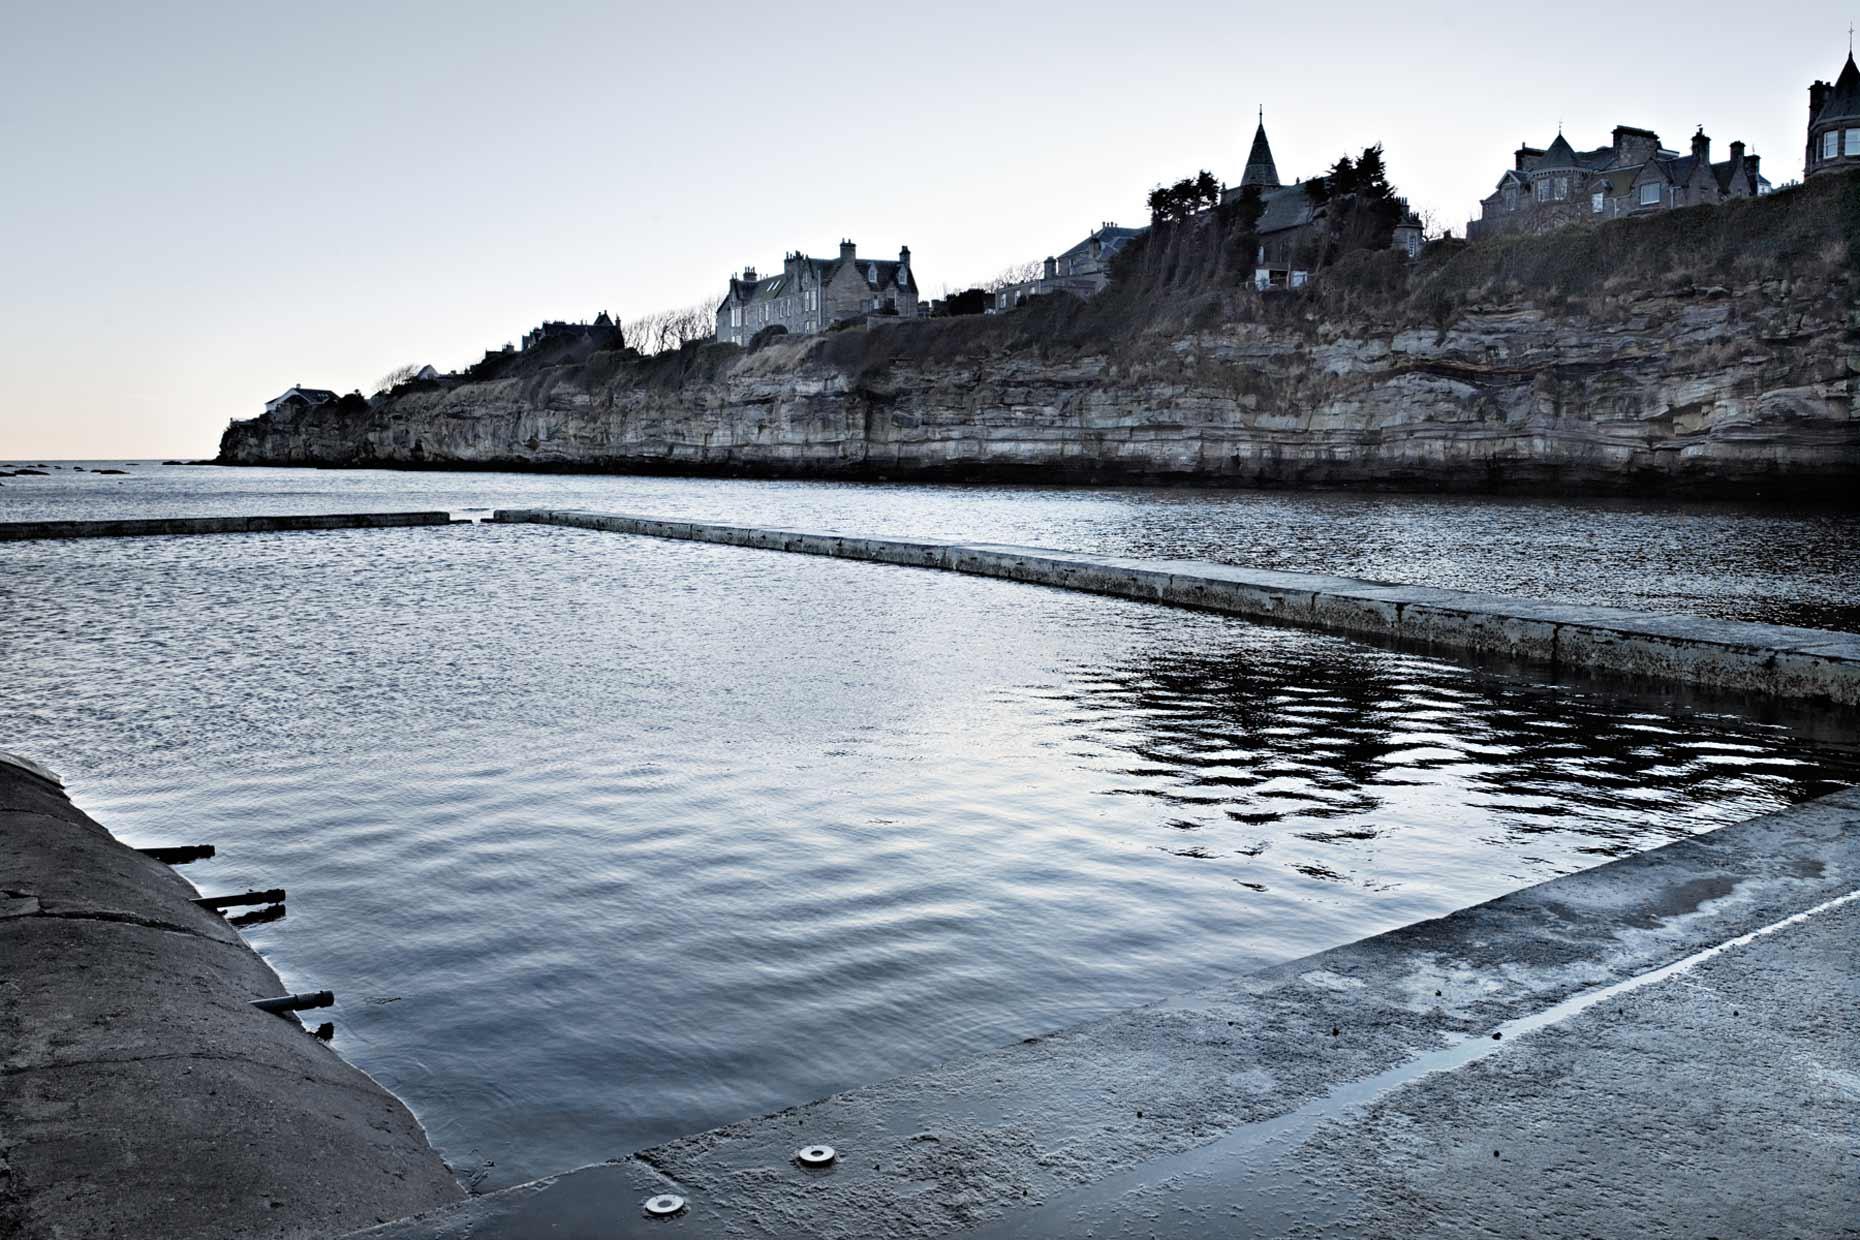 tidal-pools-scotland-pim-vuik-fotografie-film-rotterdam-02.jpg